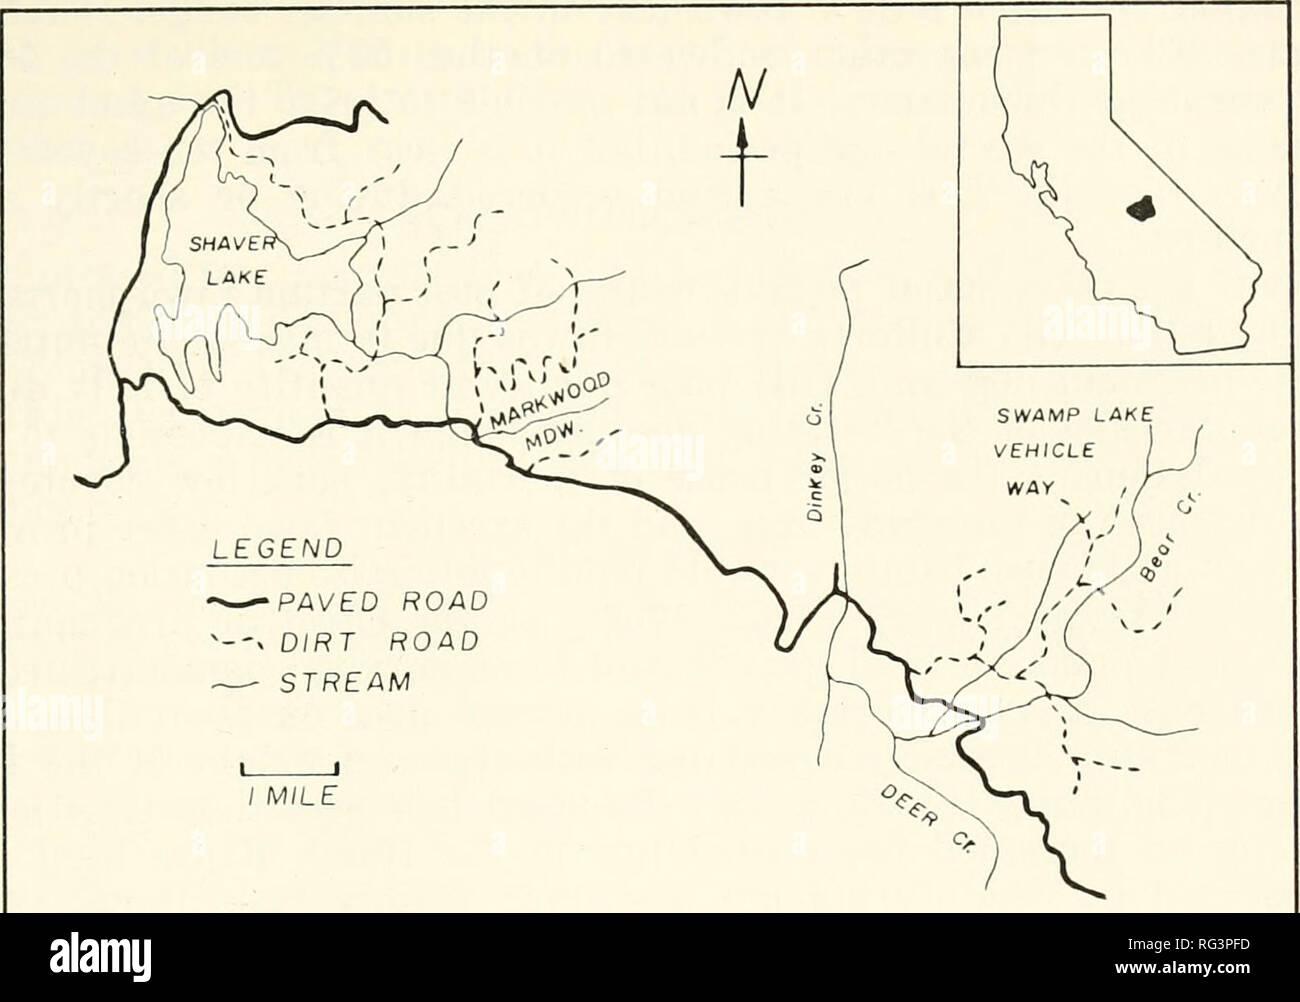 Kings County California Map.Kings County Map Stock Photos Kings County Map Stock Images Alamy